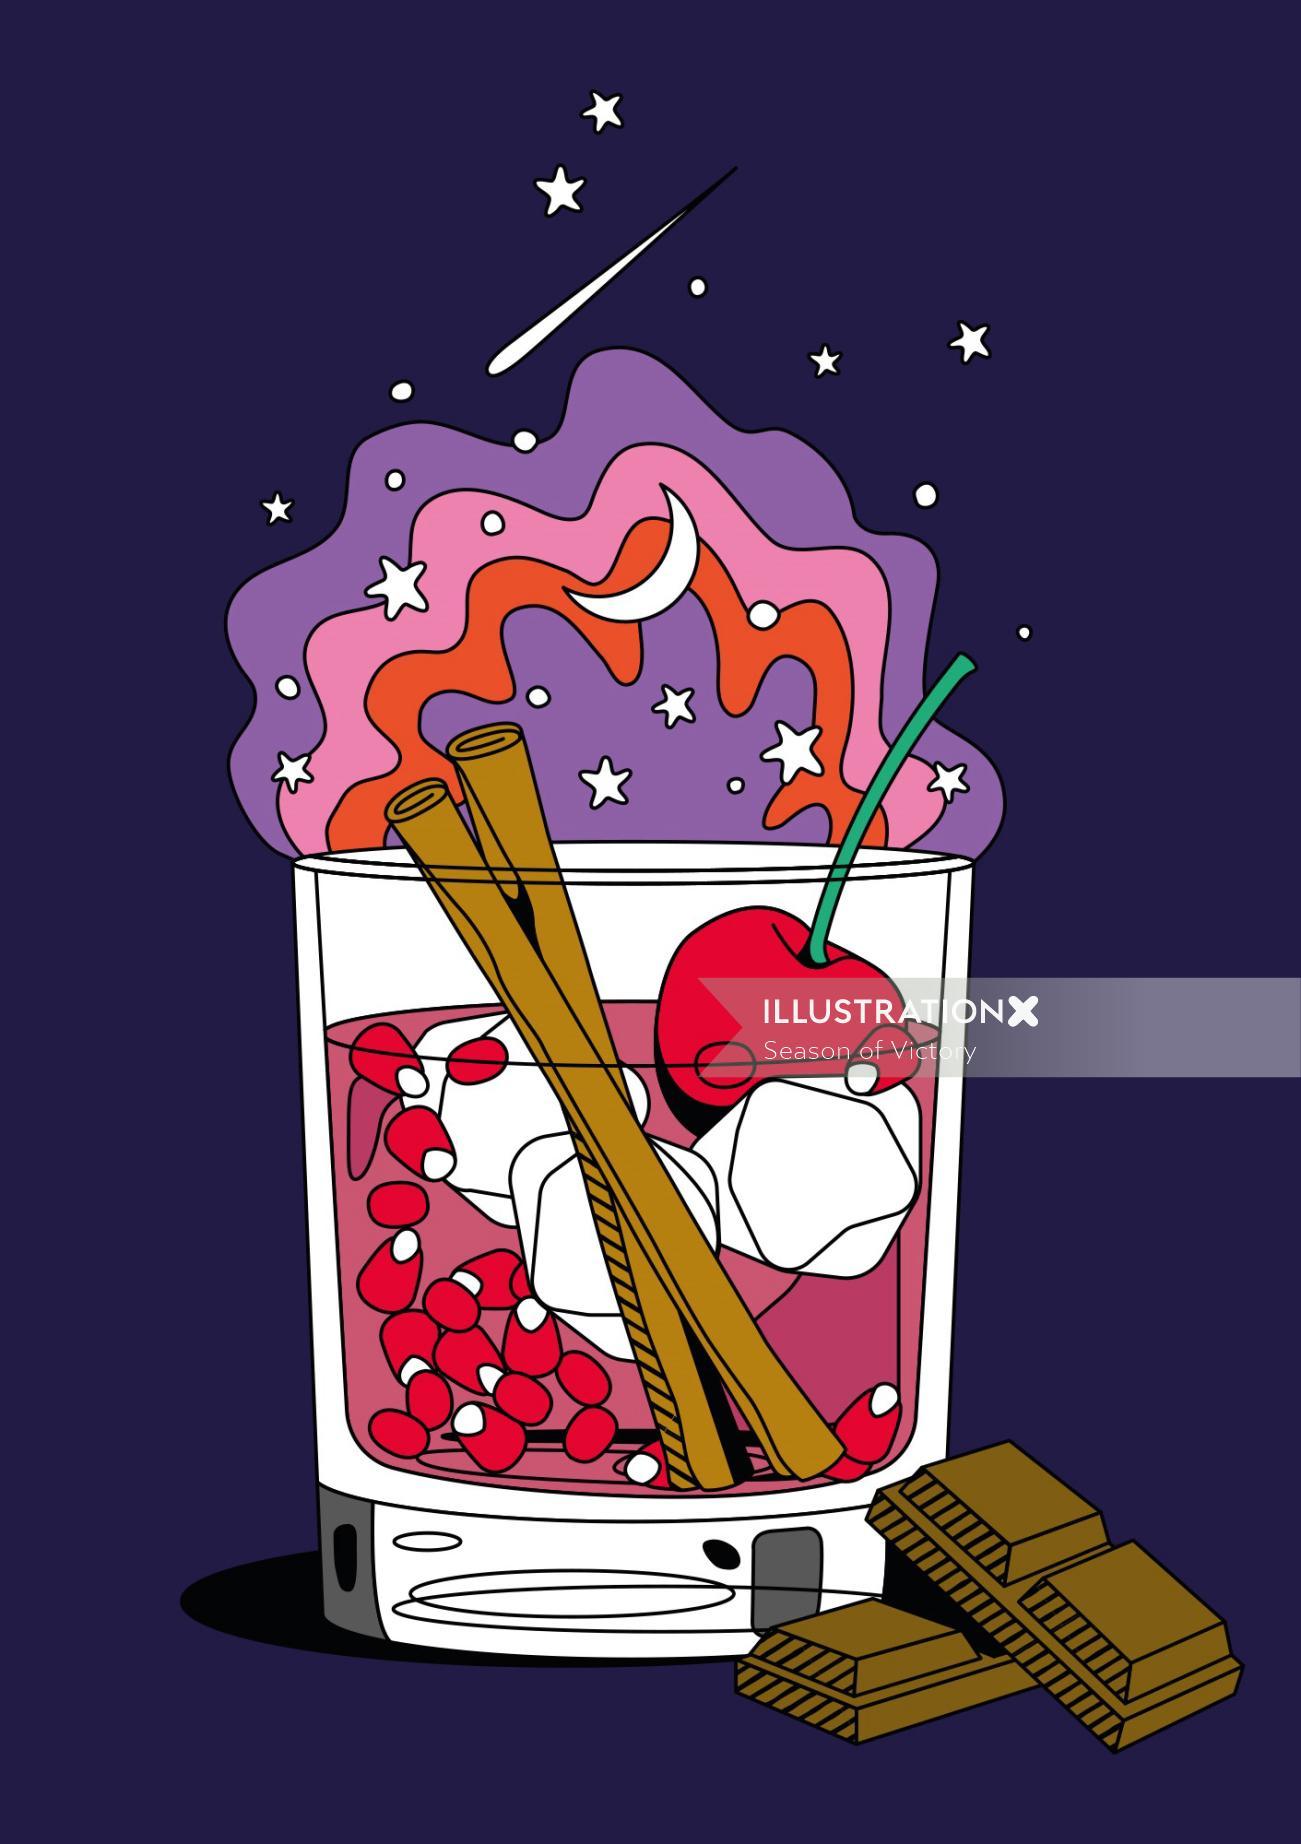 food & drink, food and beverage, gin, wine, gin illustration, spirits, editorial art, spot art, spot